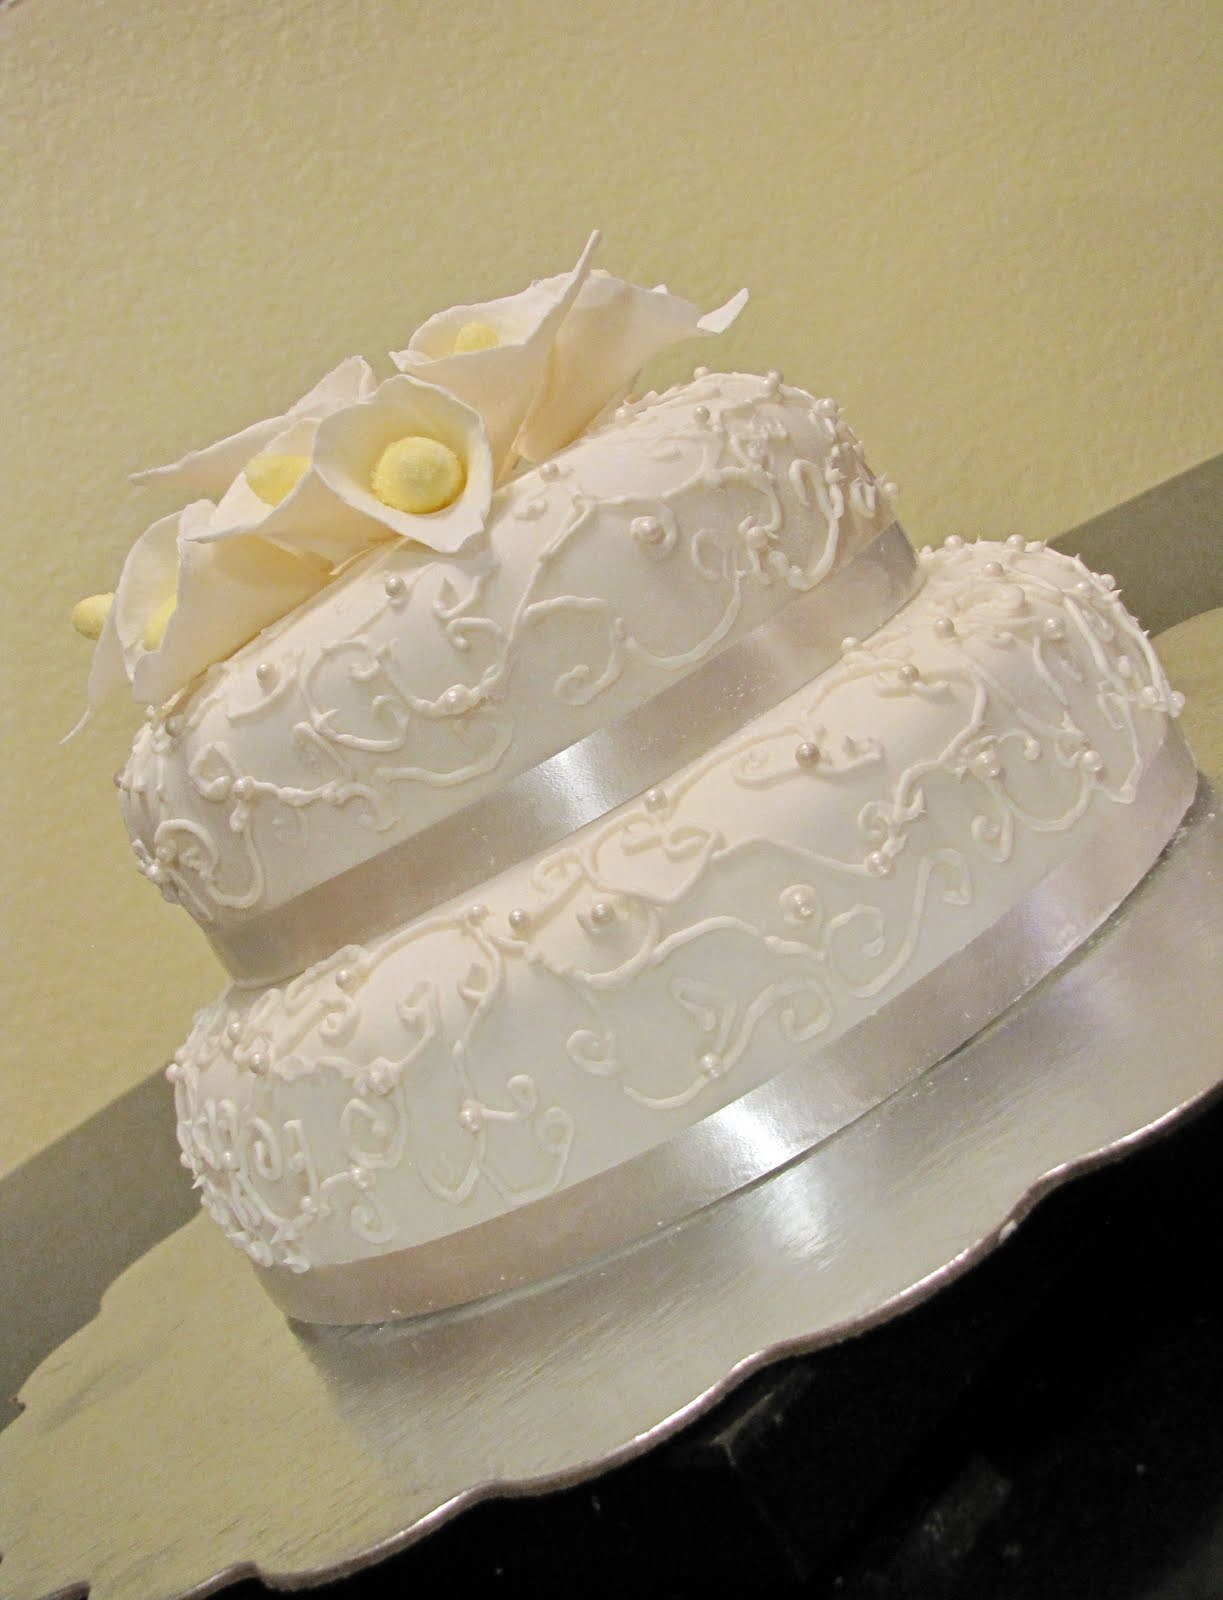 The Kitchen Sink Calla Lily Wedding Cake